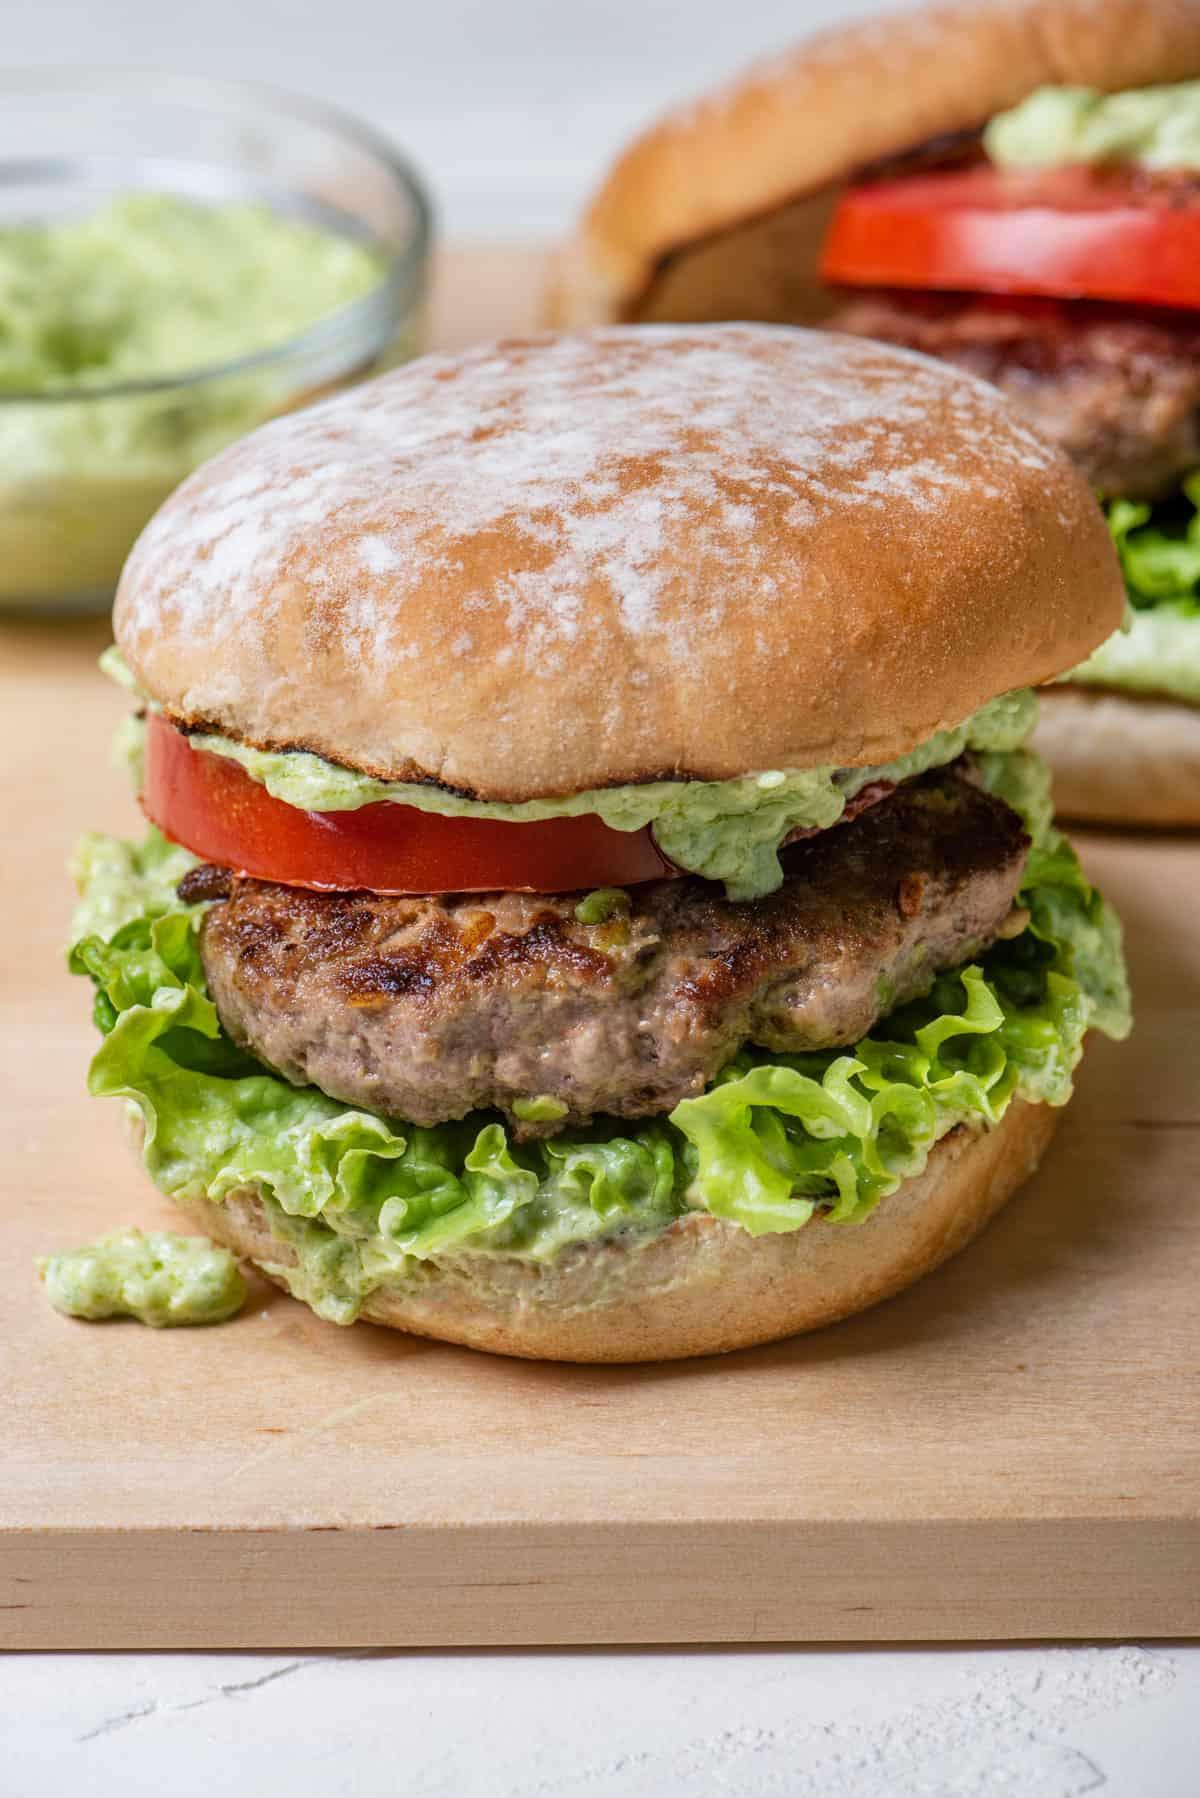 Close up shot of an avocado burger